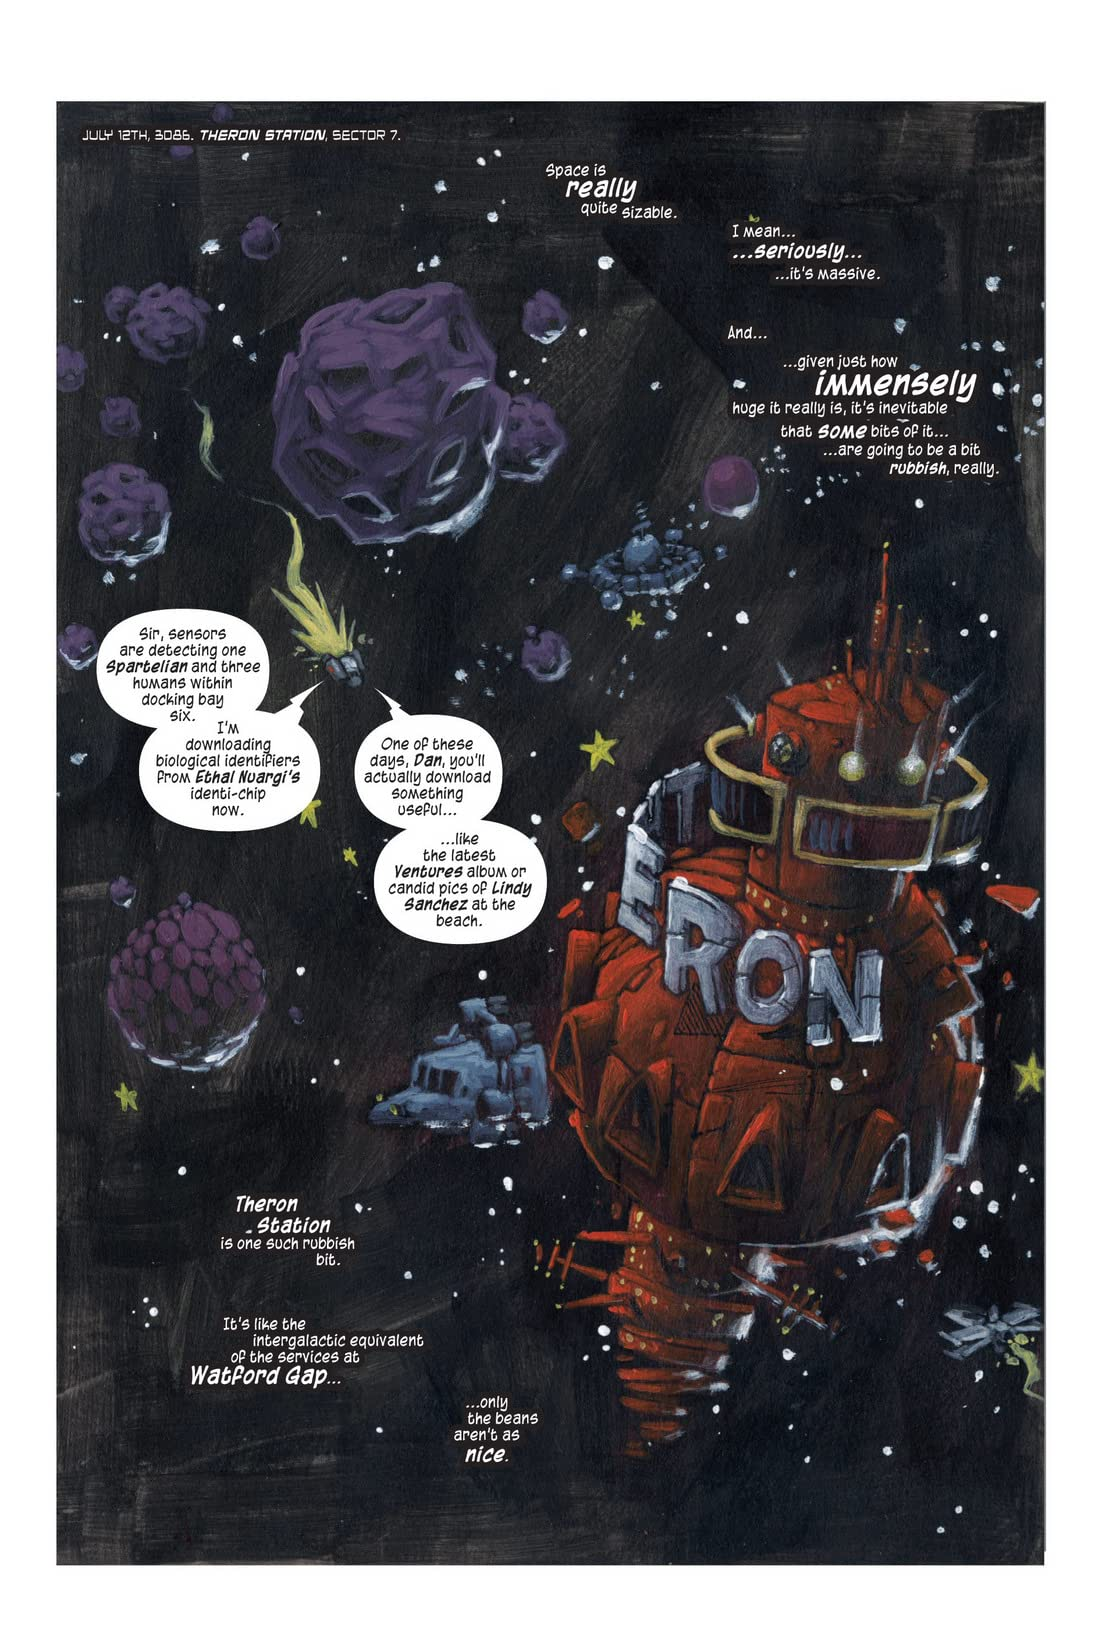 The Intergalactic Adventures of Zakk Ridley #1